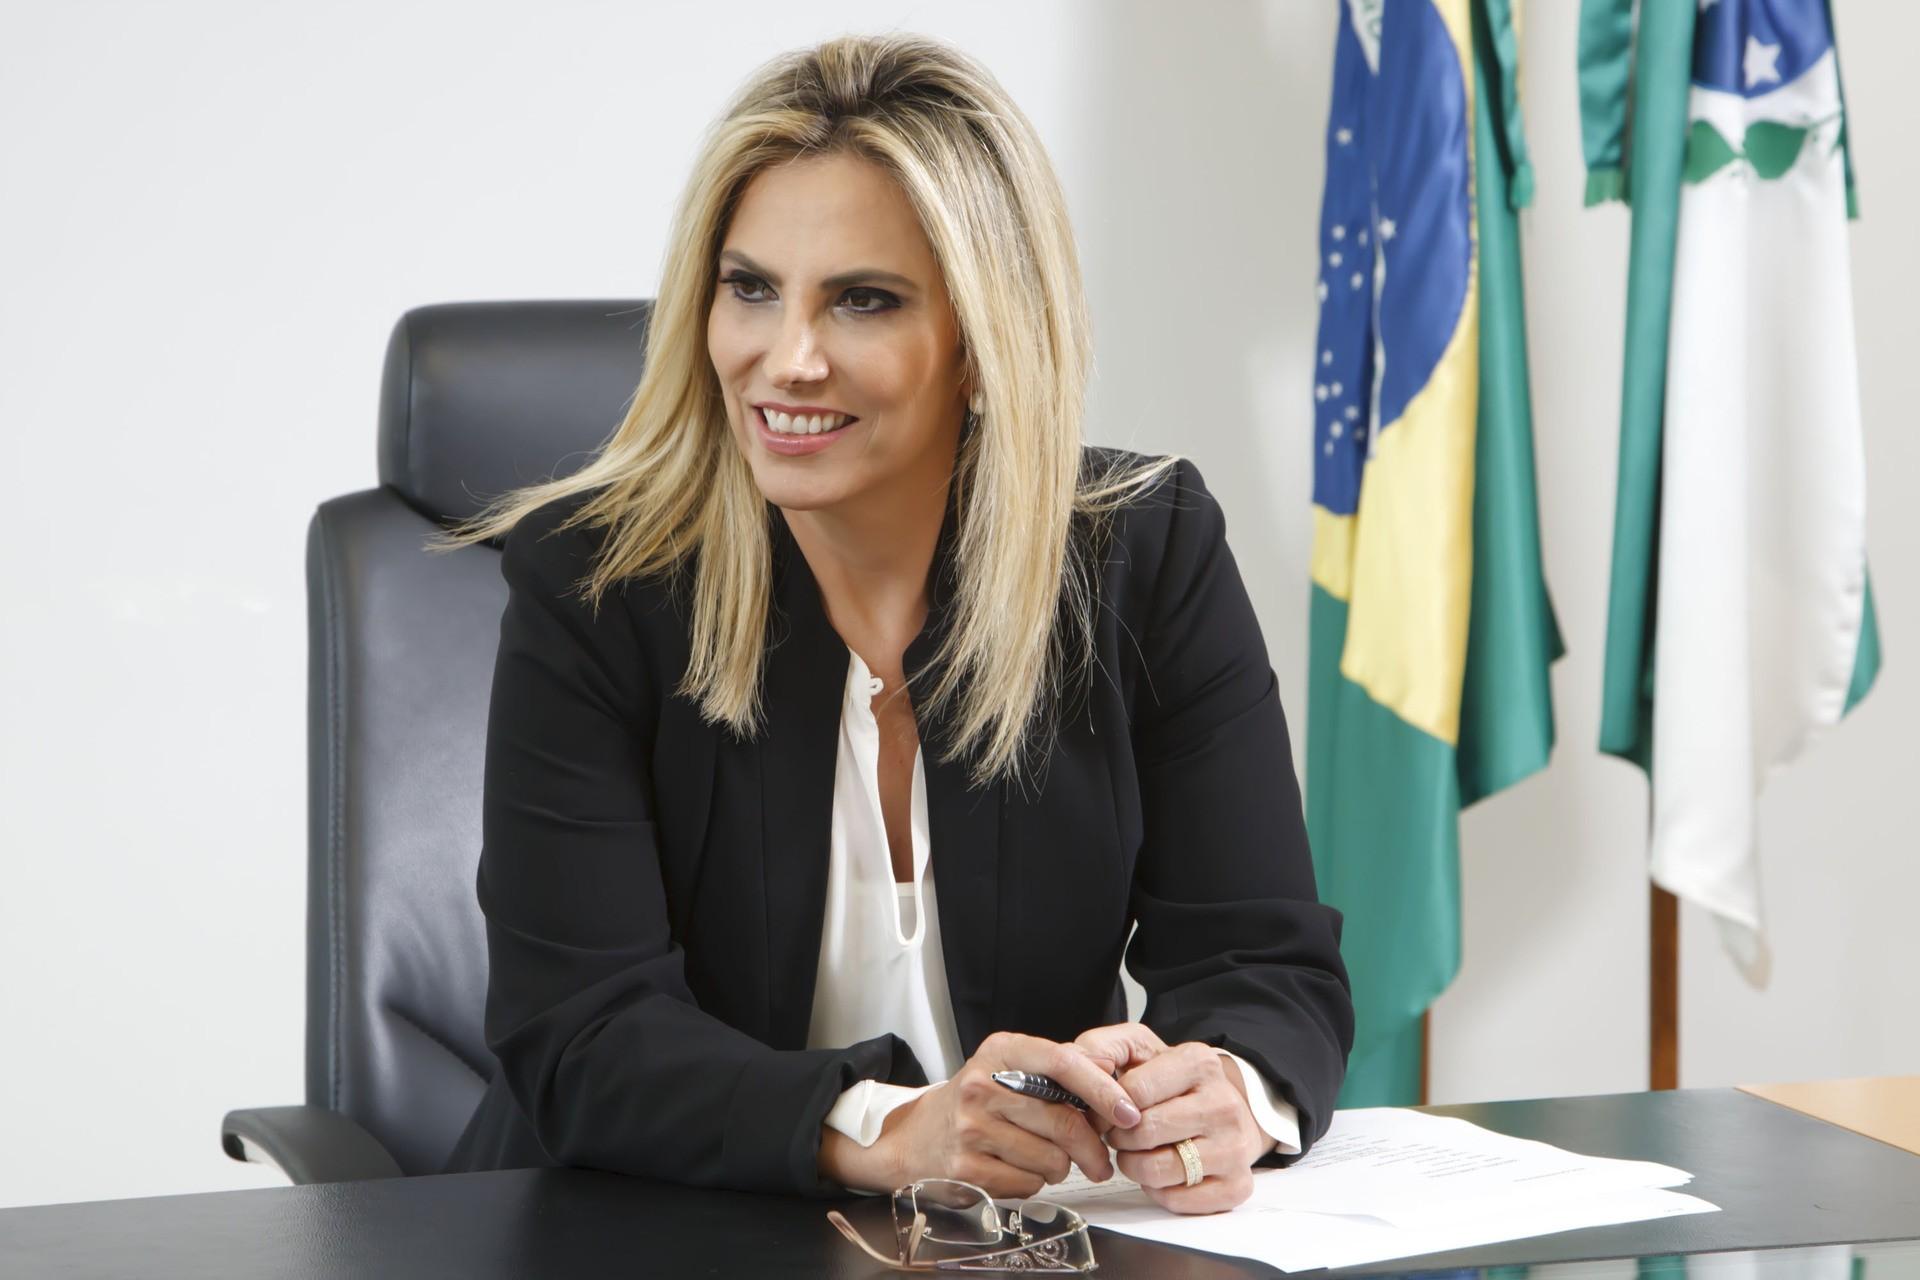 Cida Borghetti diz estar preparada para assumir governo se Richa sair candidato